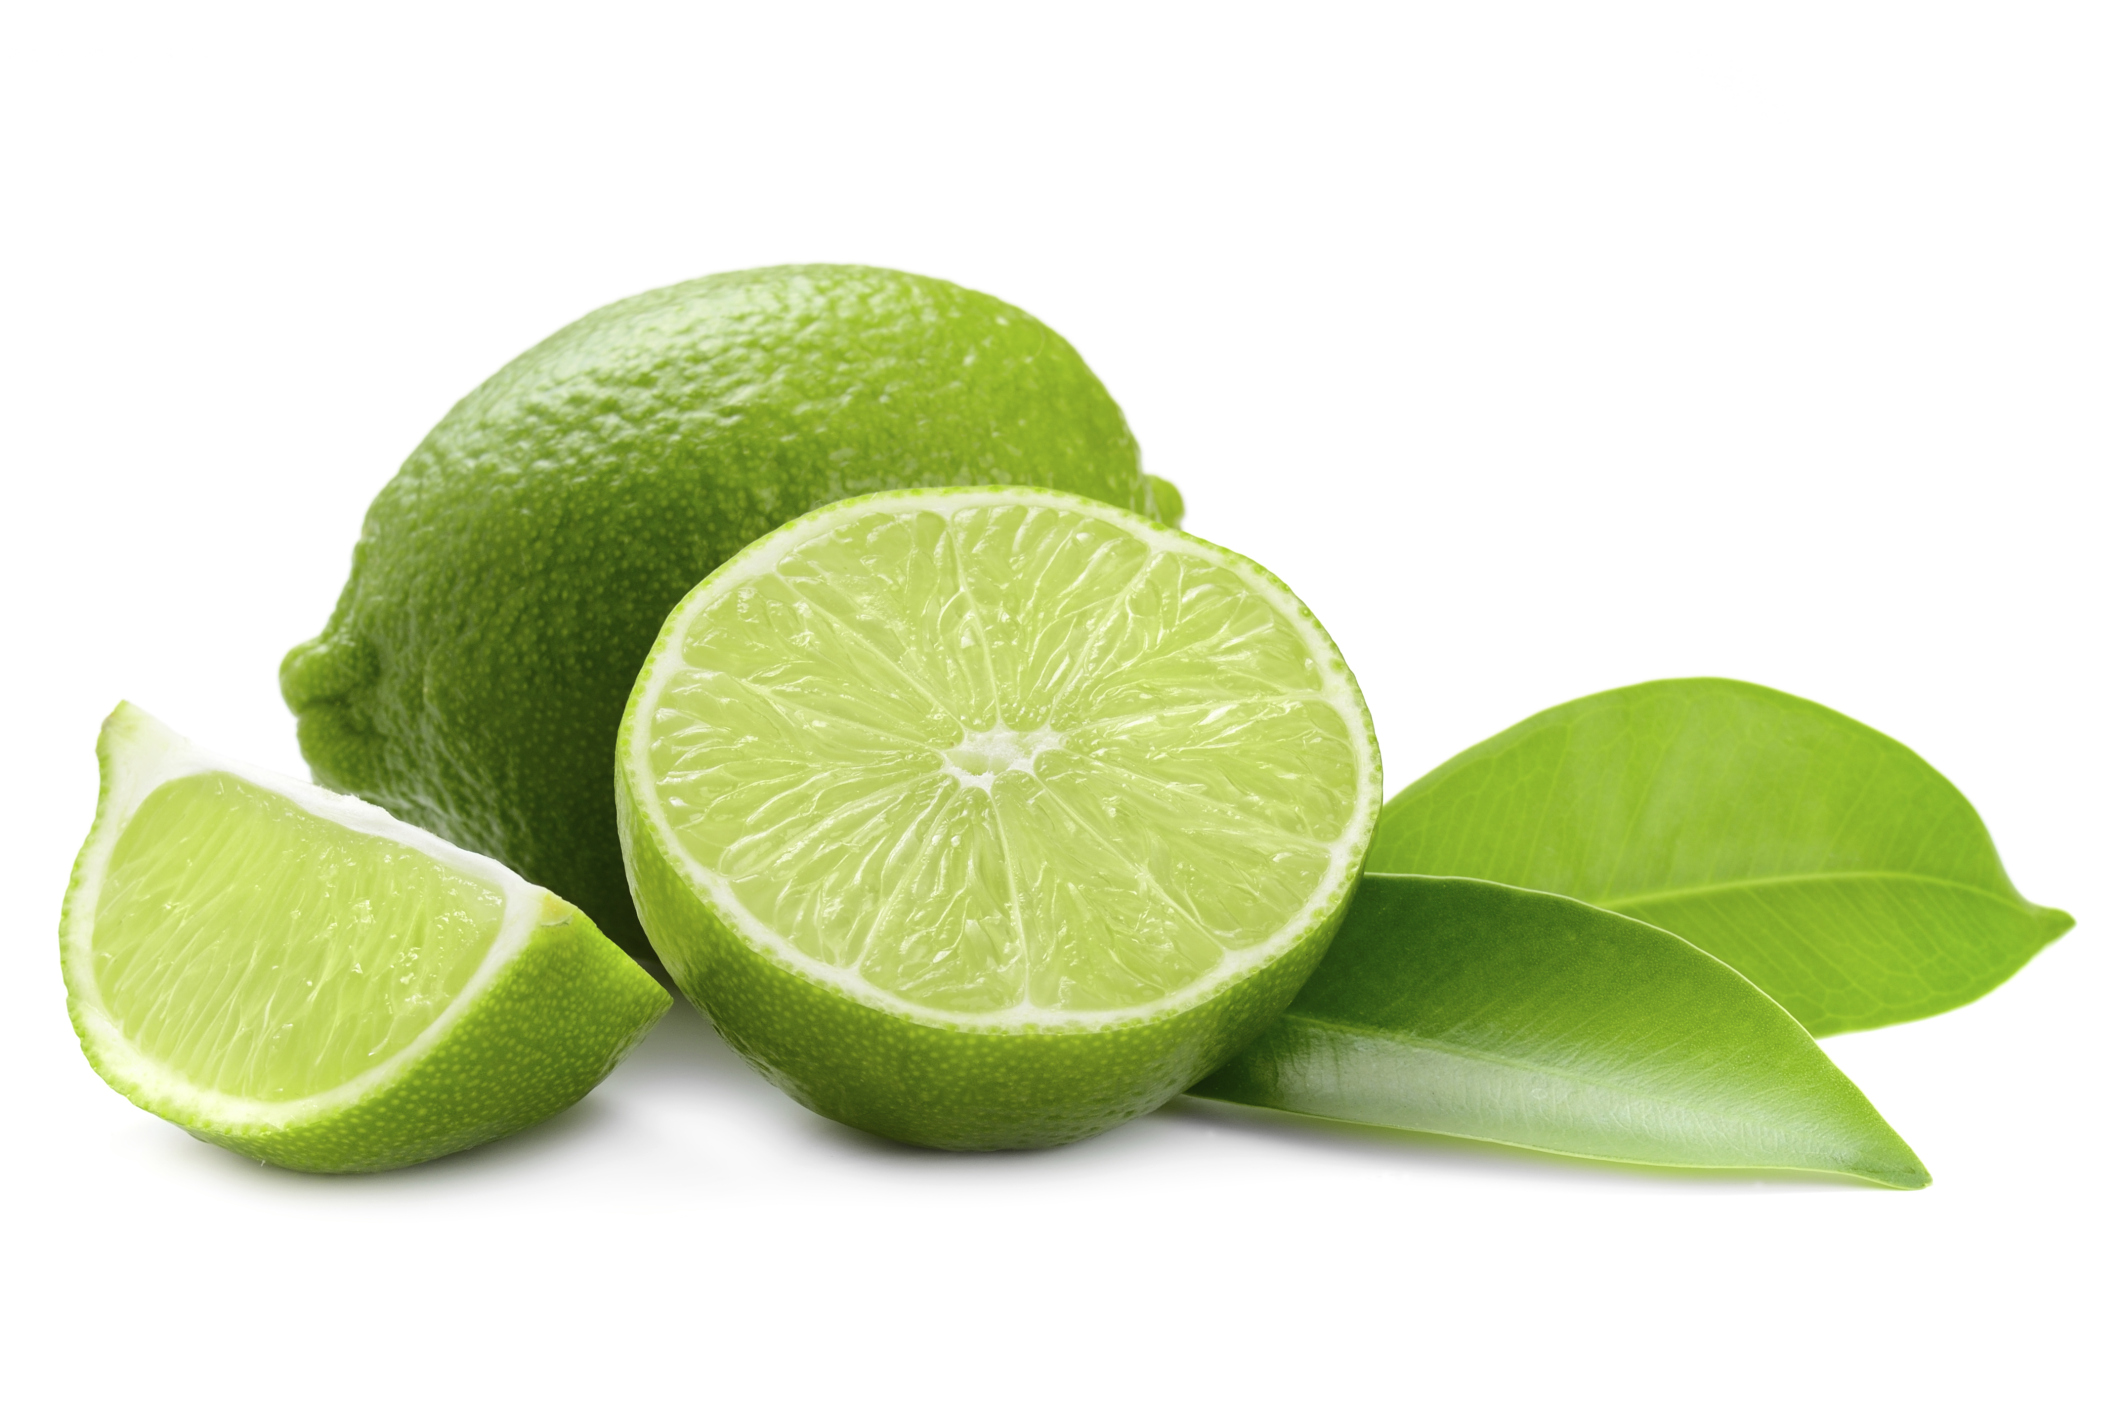 How to Substitute Lemon Extract for Lemon Zest | LEAFtv